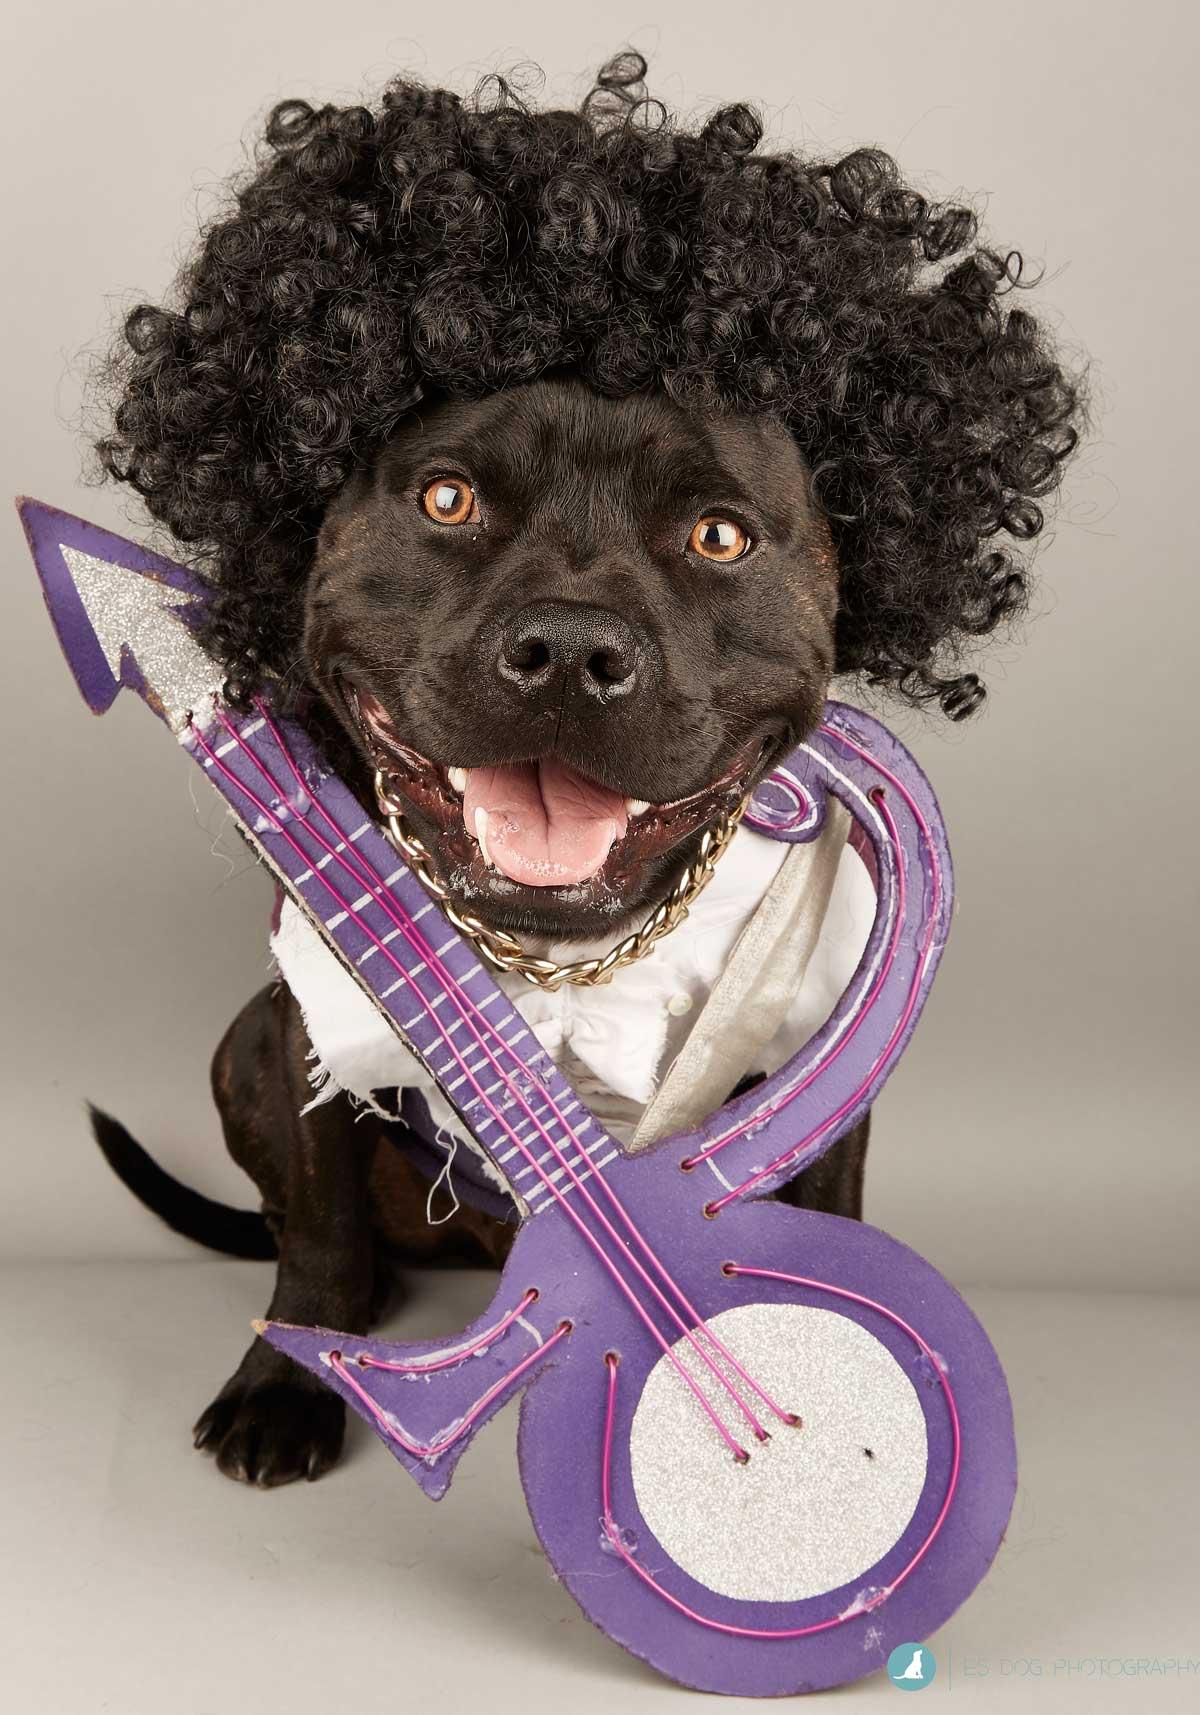 Rufio aka Prince